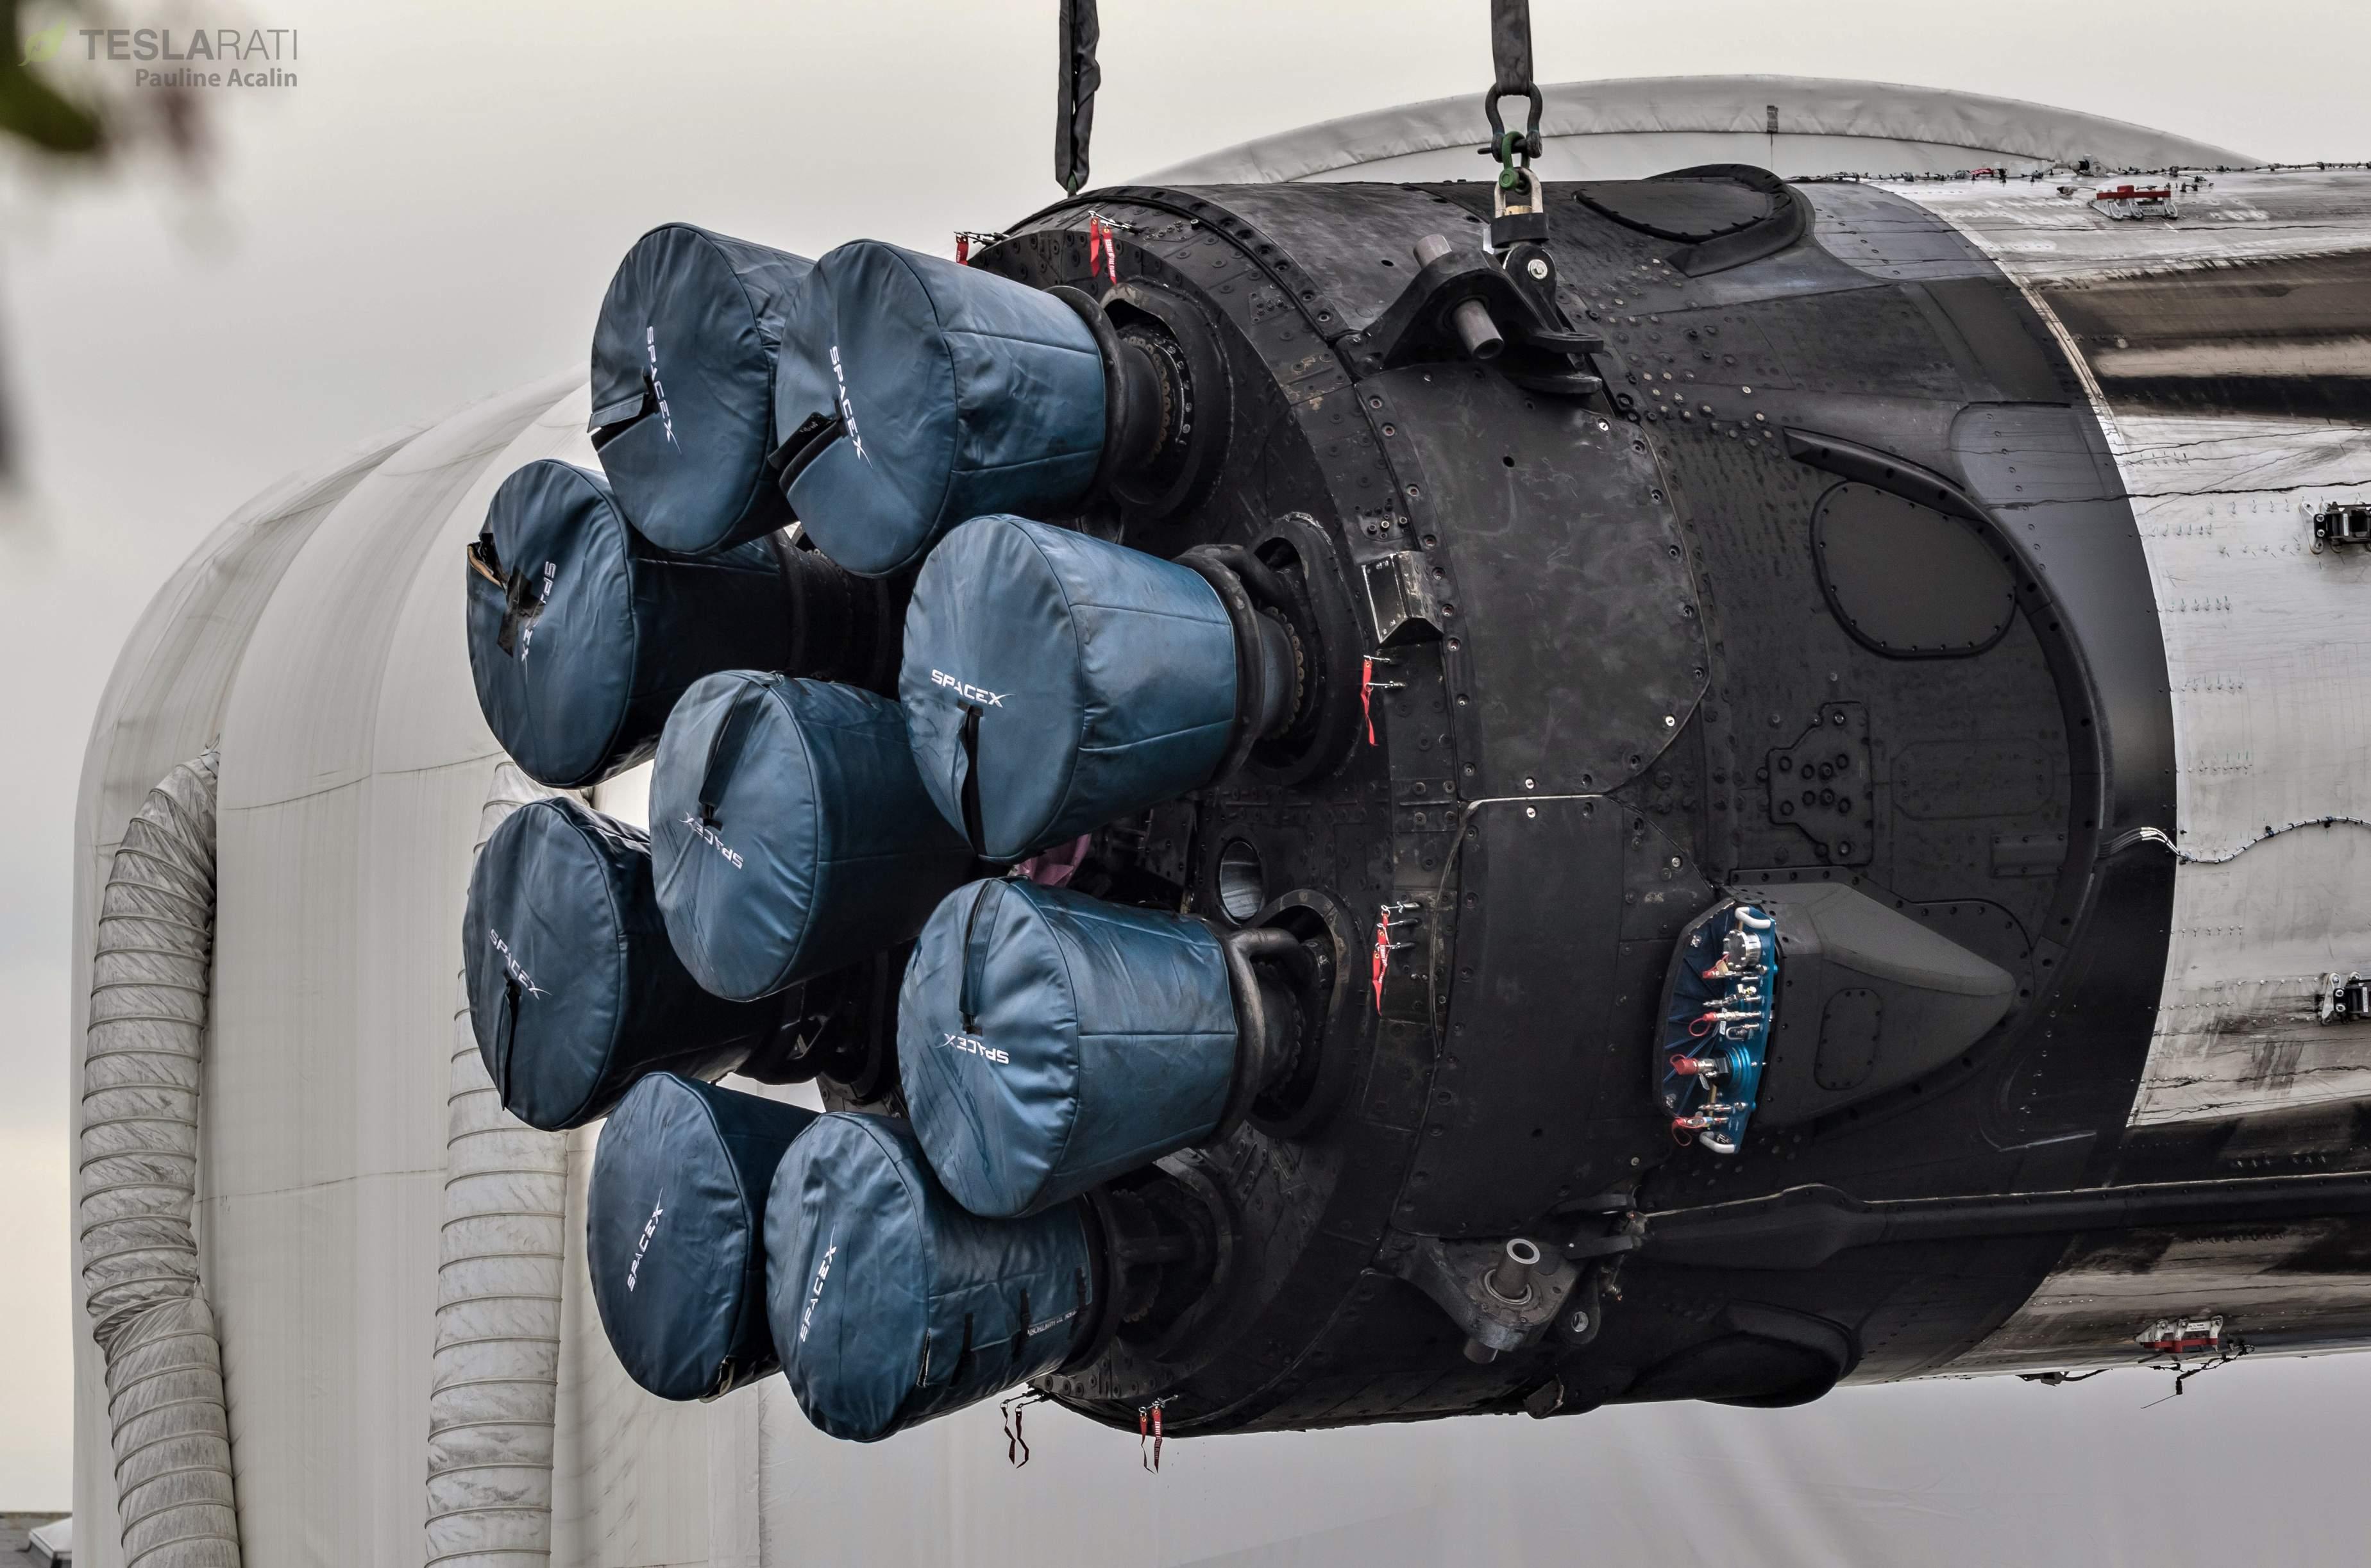 Falcon 9 B1046 SSO-A horizontal flip 121018 (Pauline Acalin) 2(c)